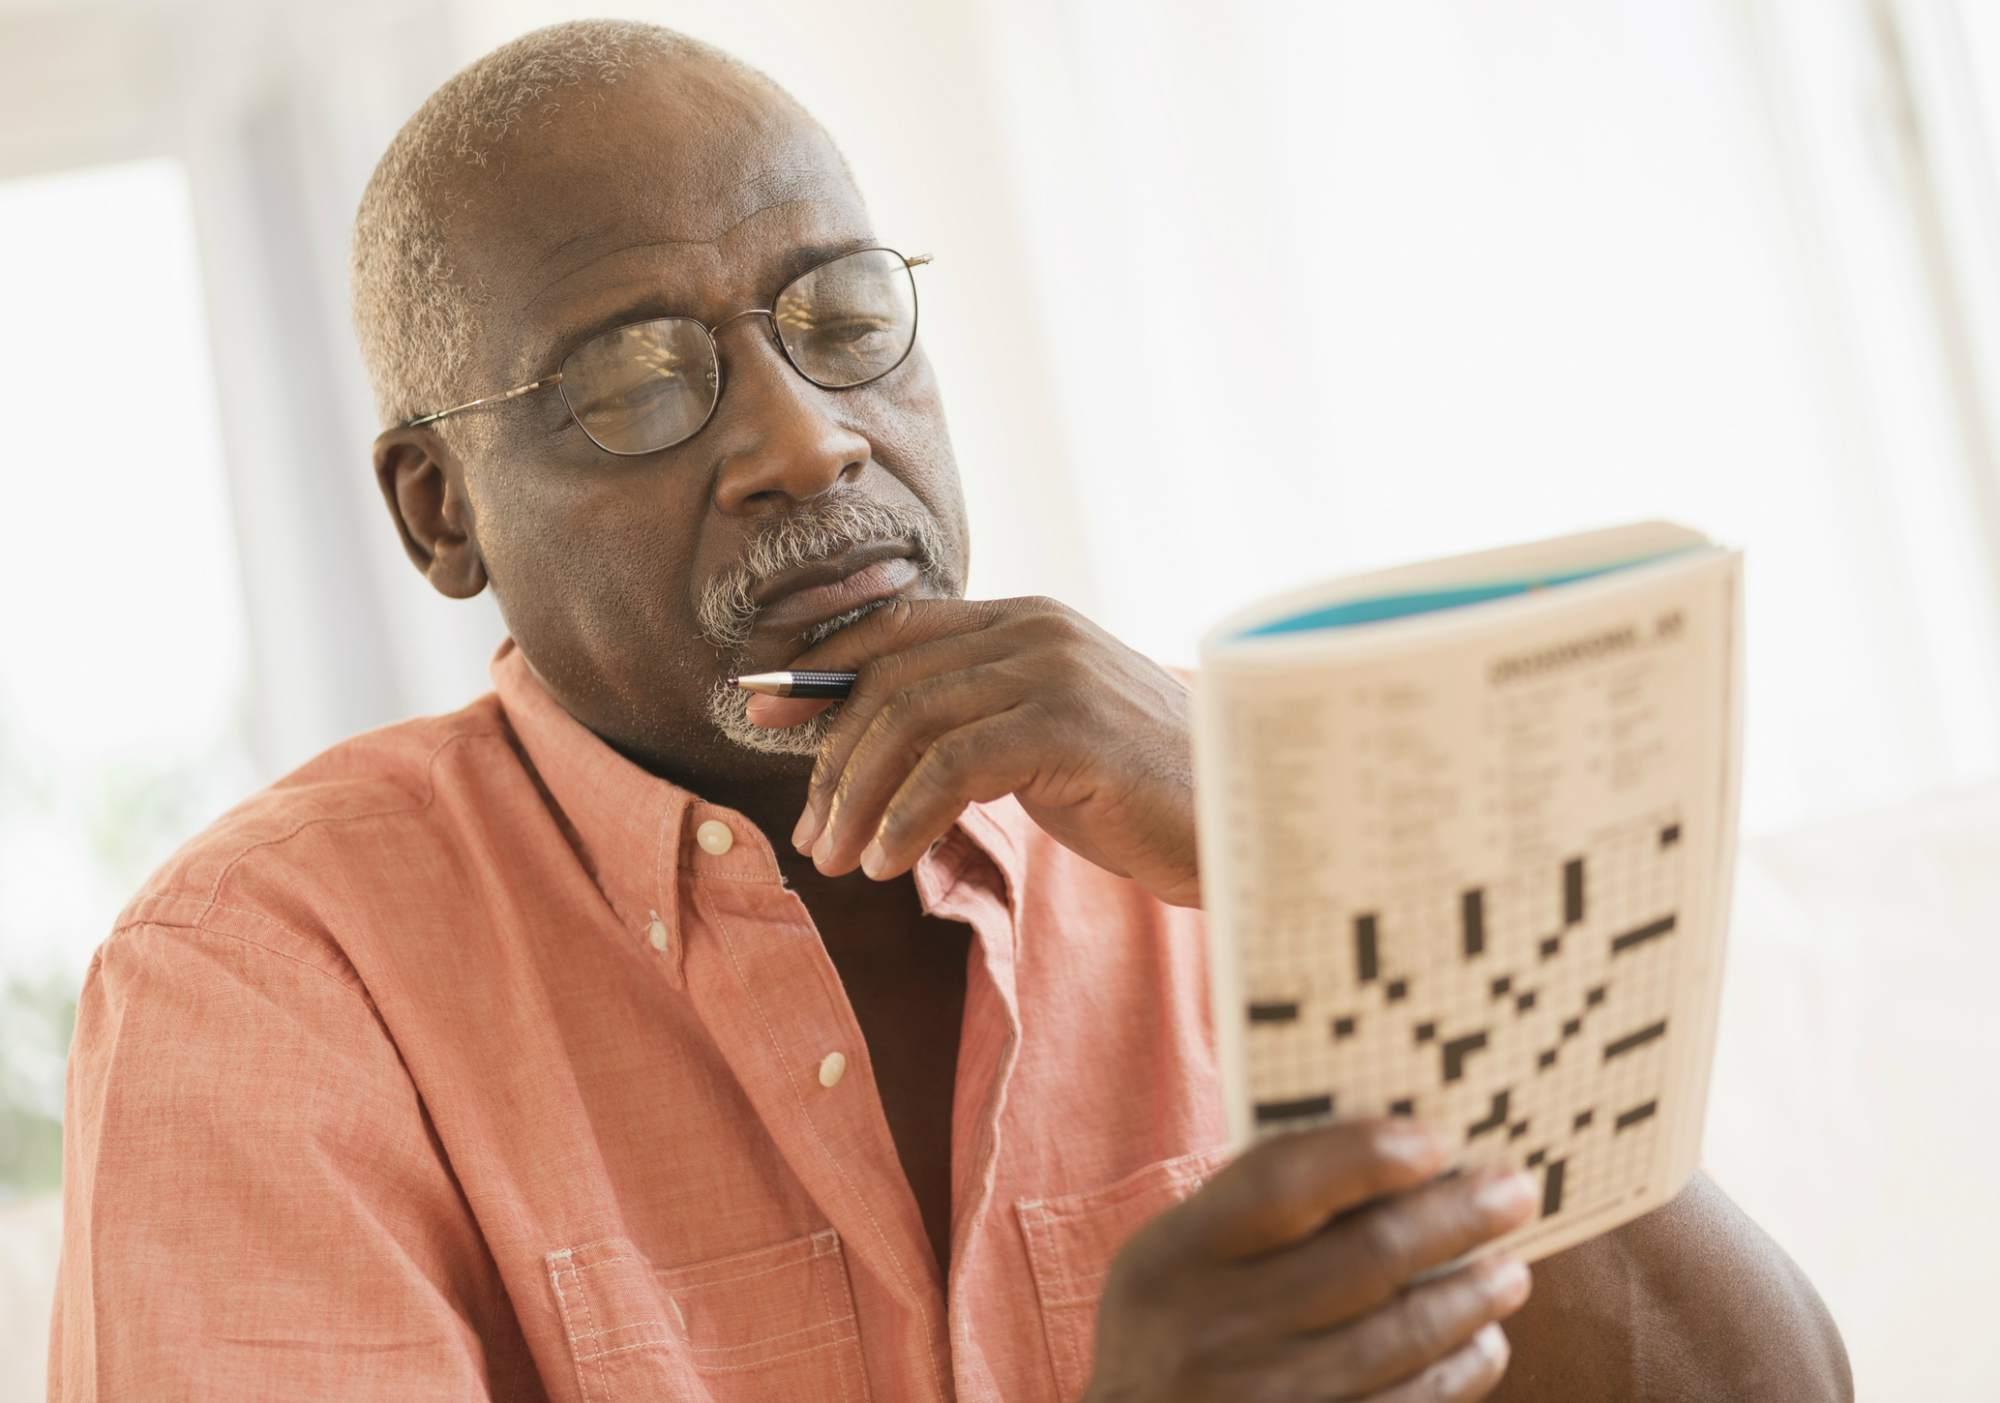 Older man doing a crossword